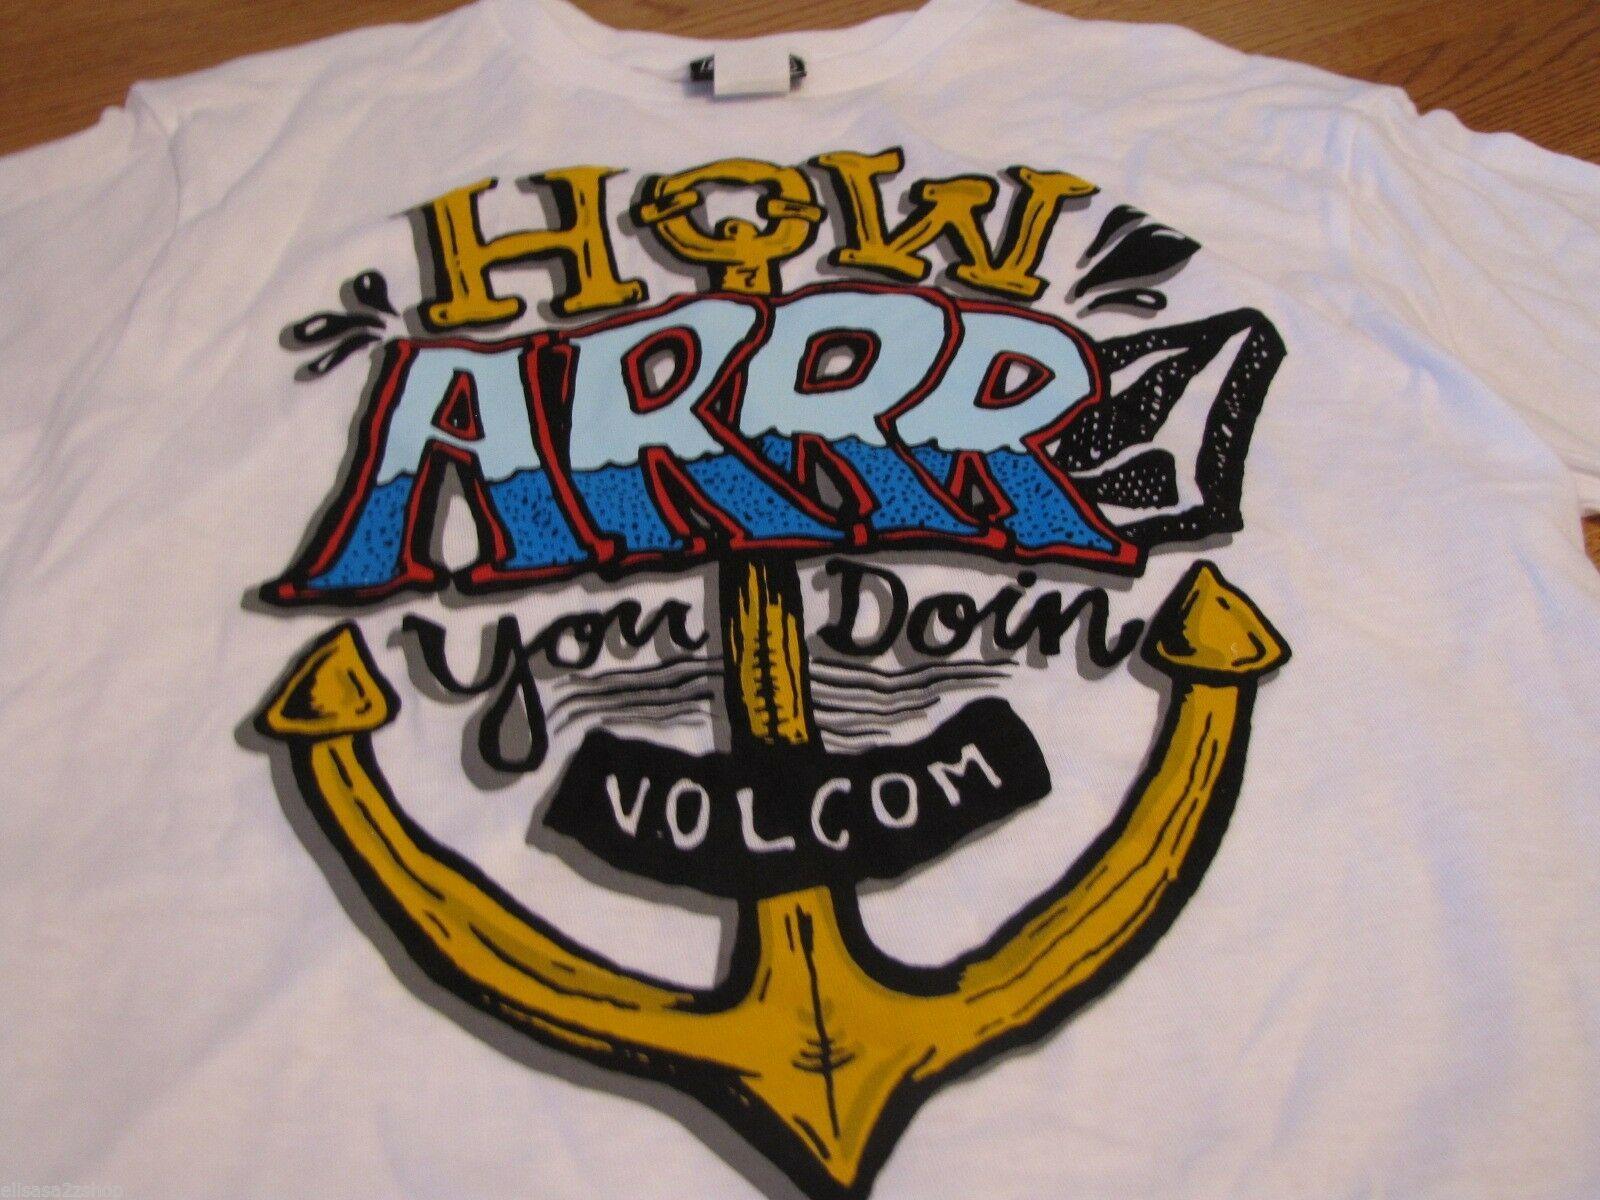 Boy's youth kids Volcom Stone t shirt HOW ARRR you doin white SPOT large L NEW